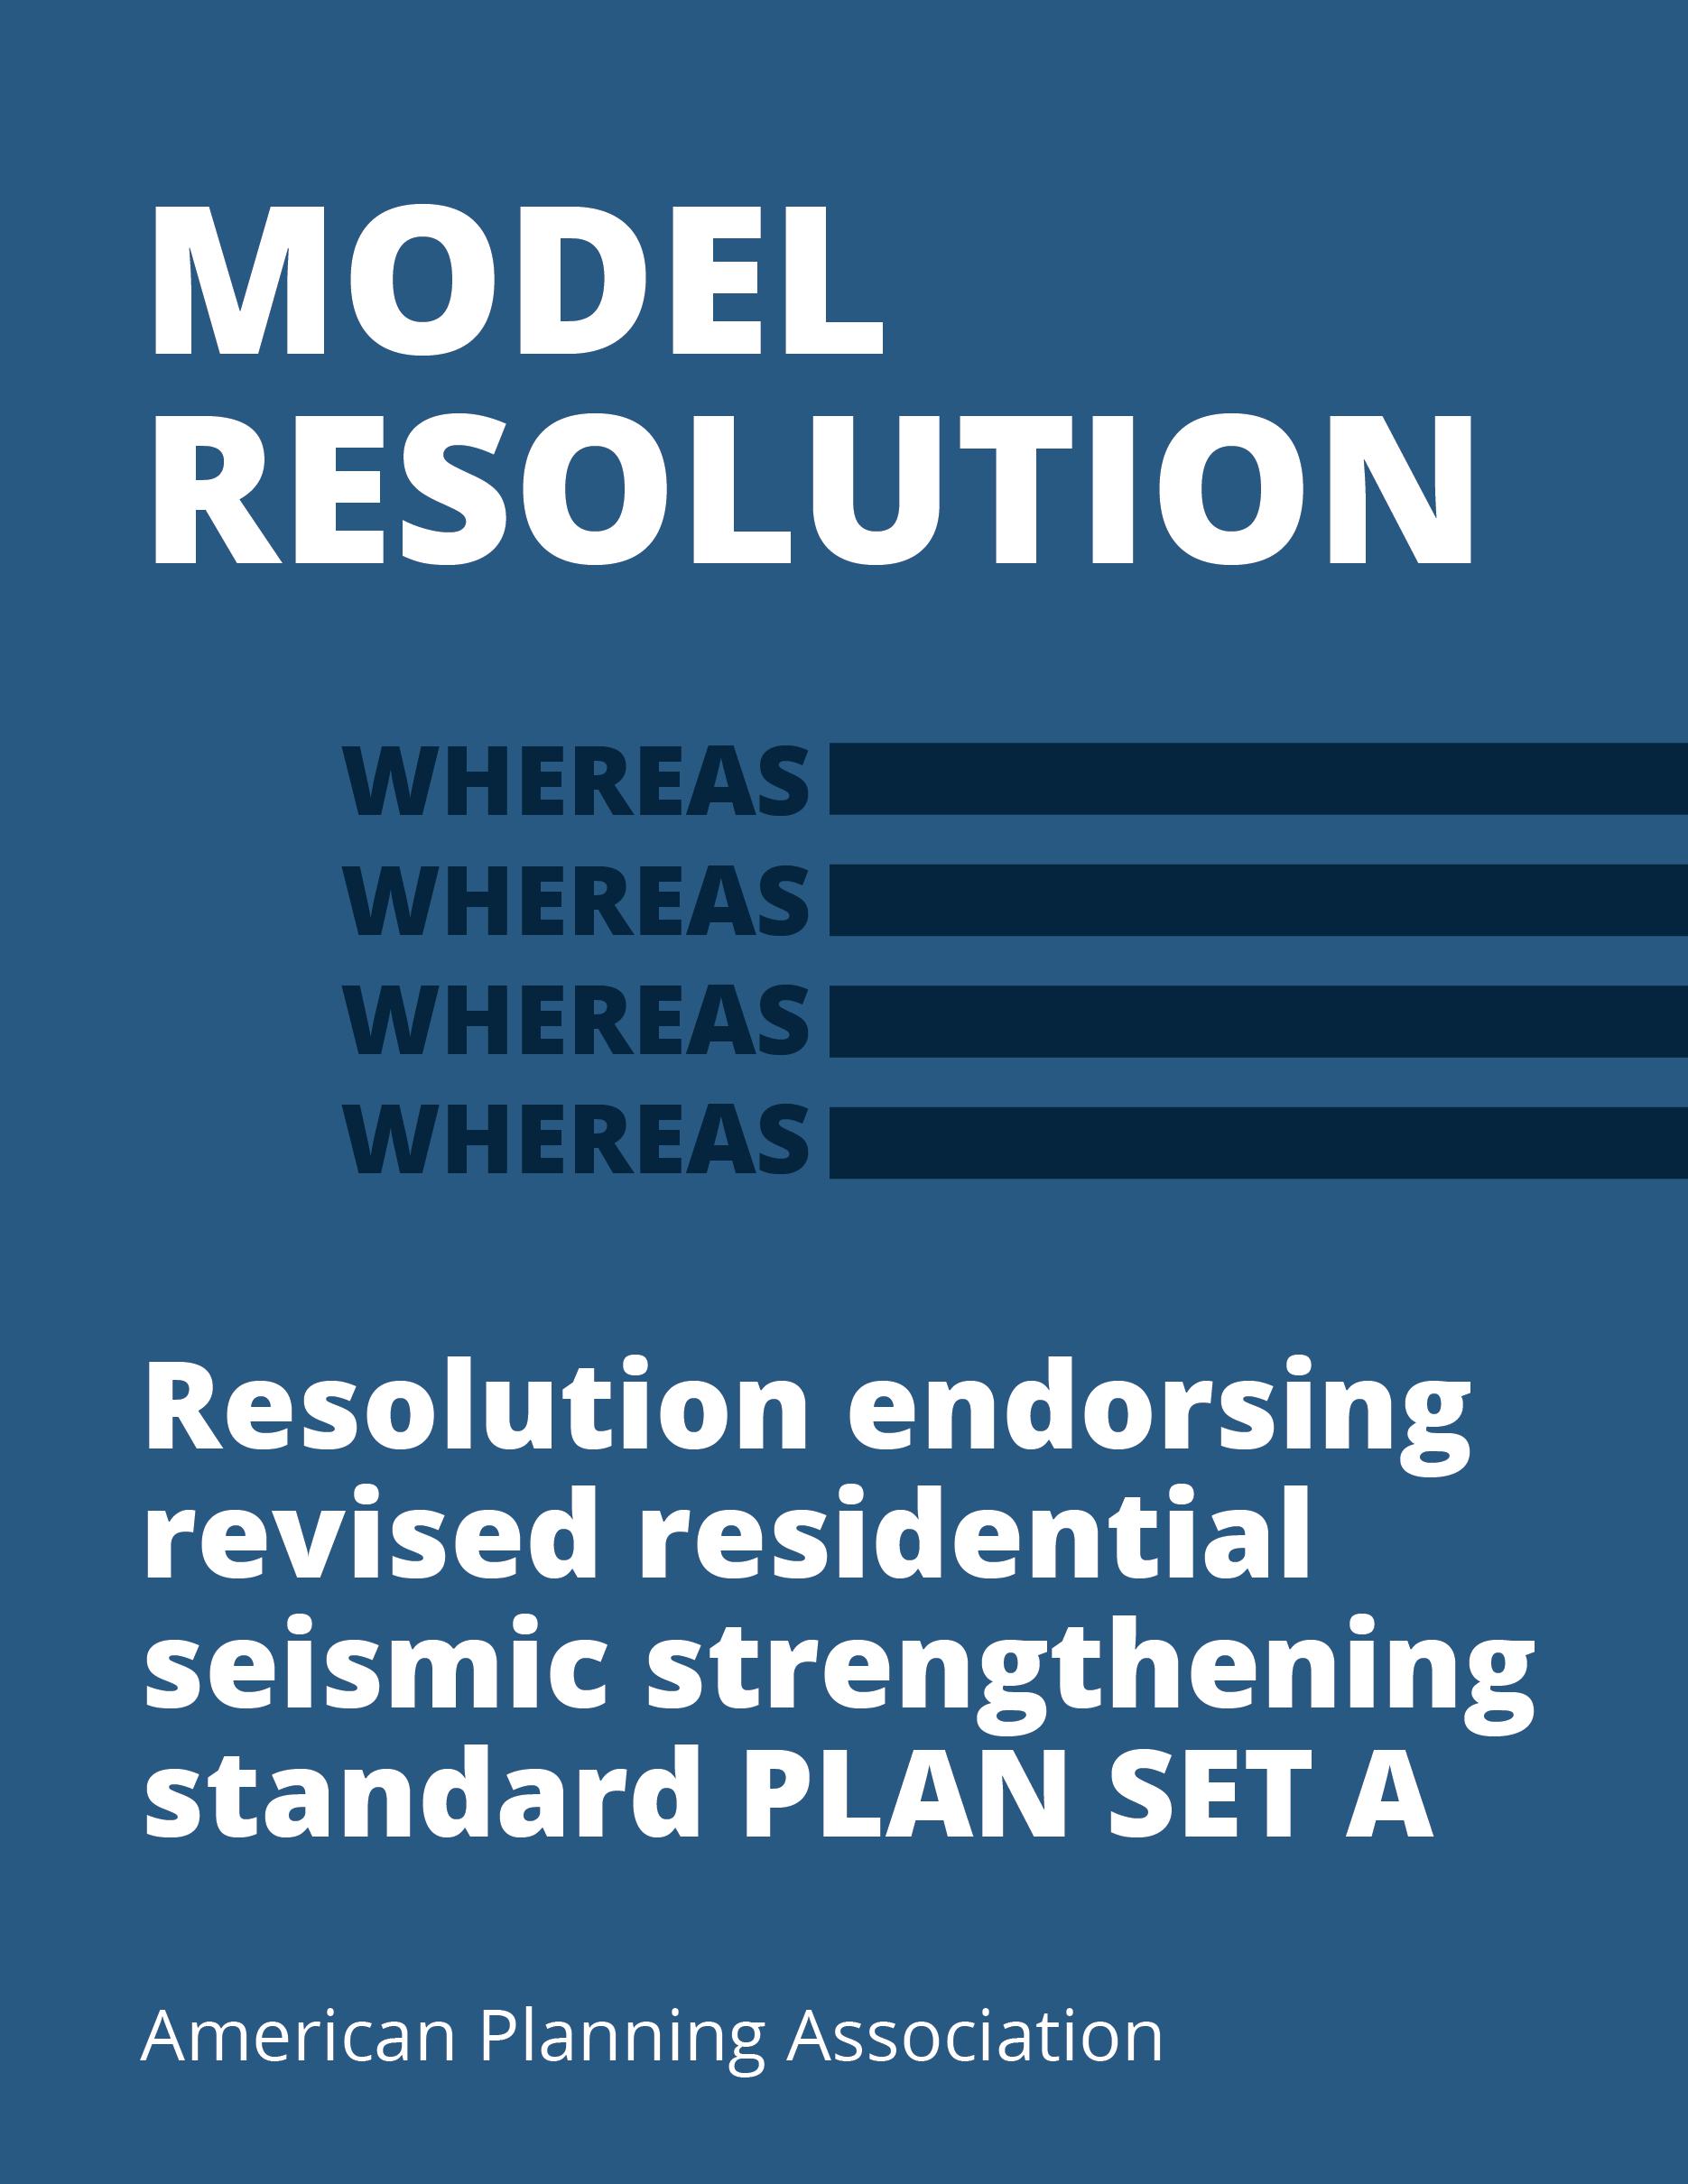 Model Resolution for Crawl Space Retrofit Cover